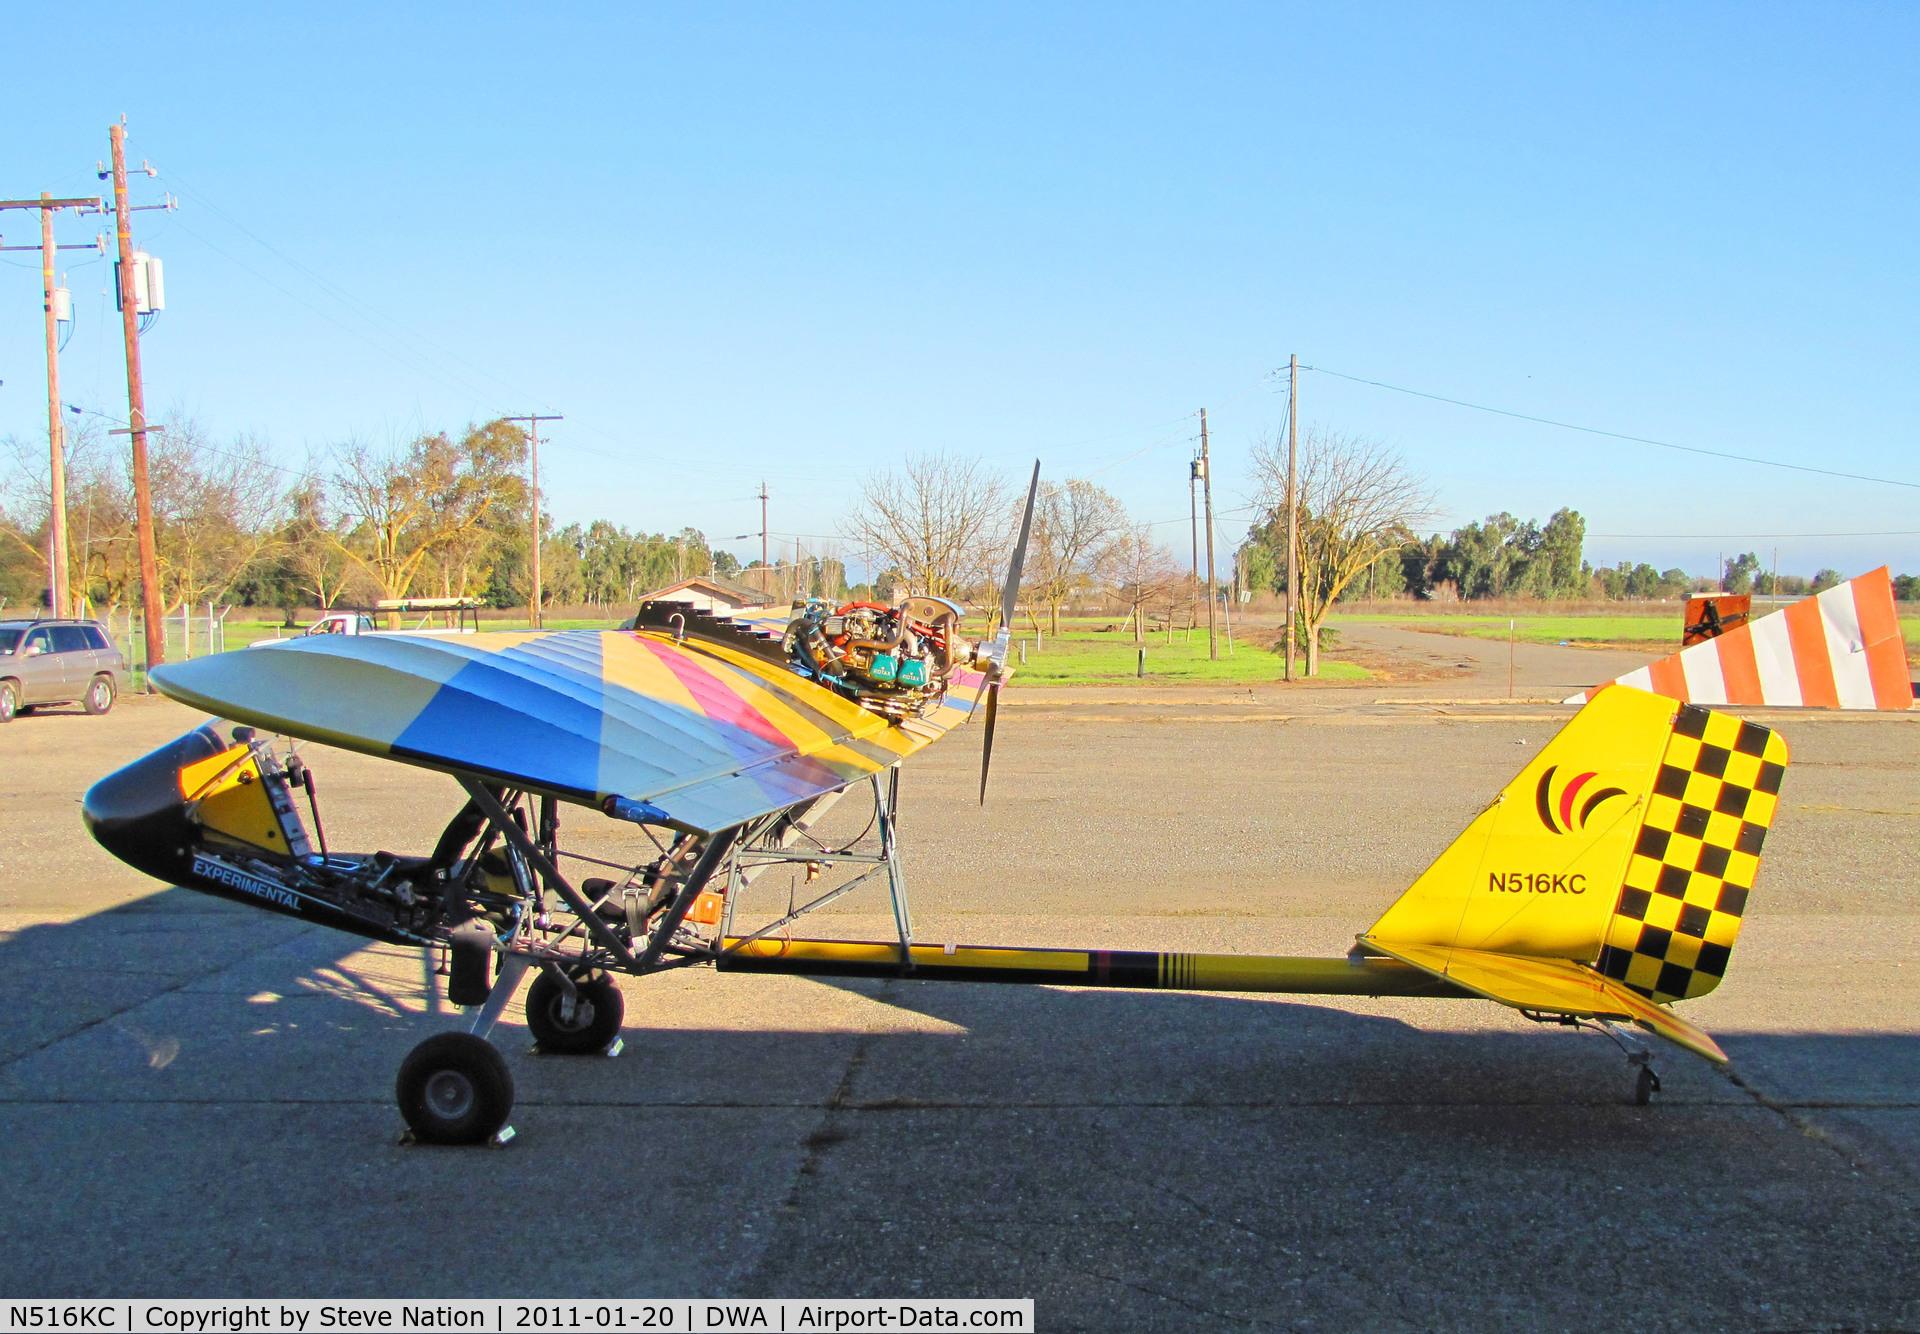 N516KC, Rans S-18 Stinger II C/N 0504040, 2010 McCarty RANS S-18 homebuilt @ Yolo County Airport, CA